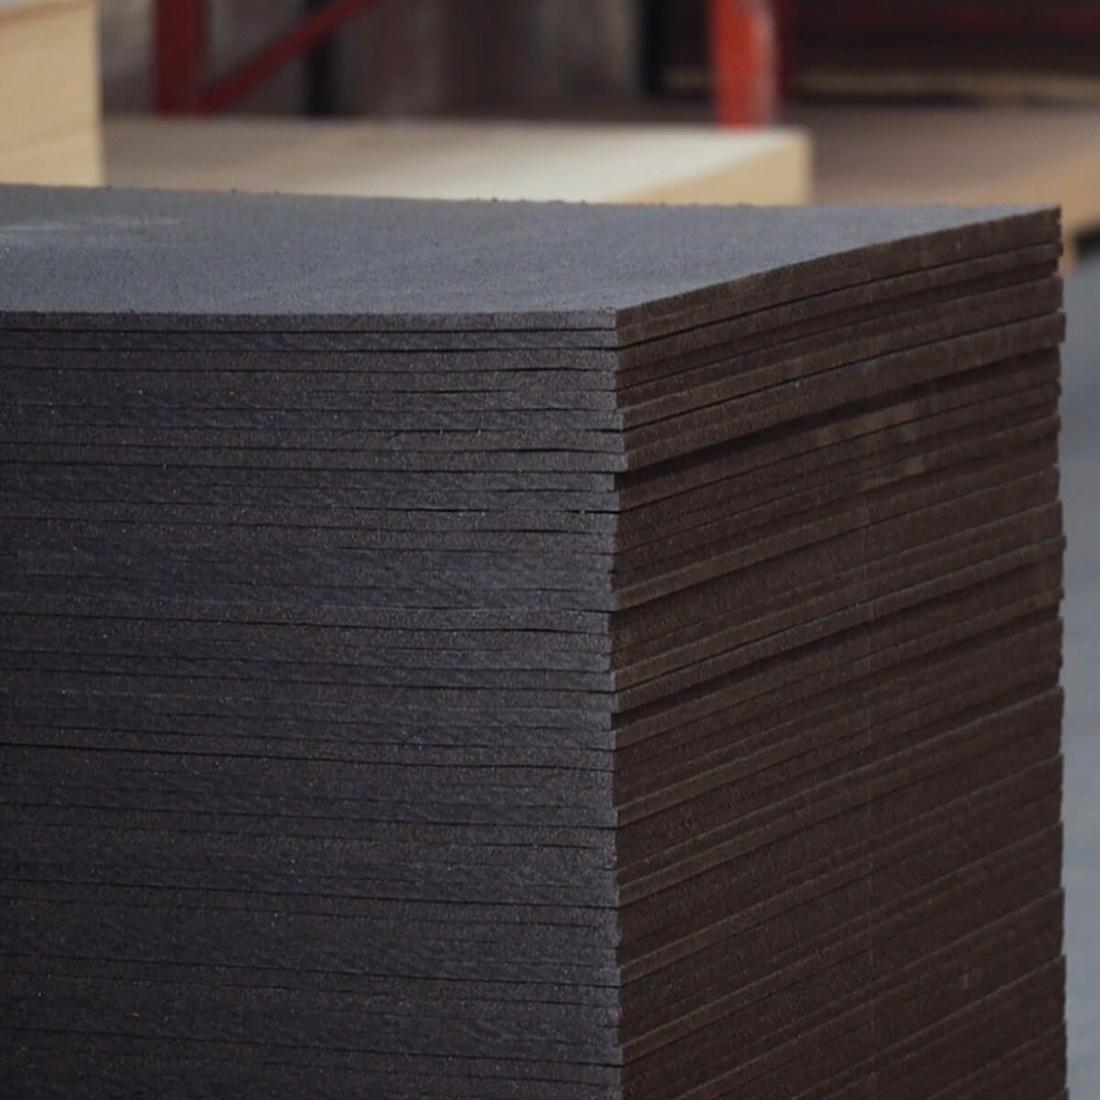 IBS Primed Softboard 2440 x 1200 x 12 mm Black Wood Fiber SBP122412